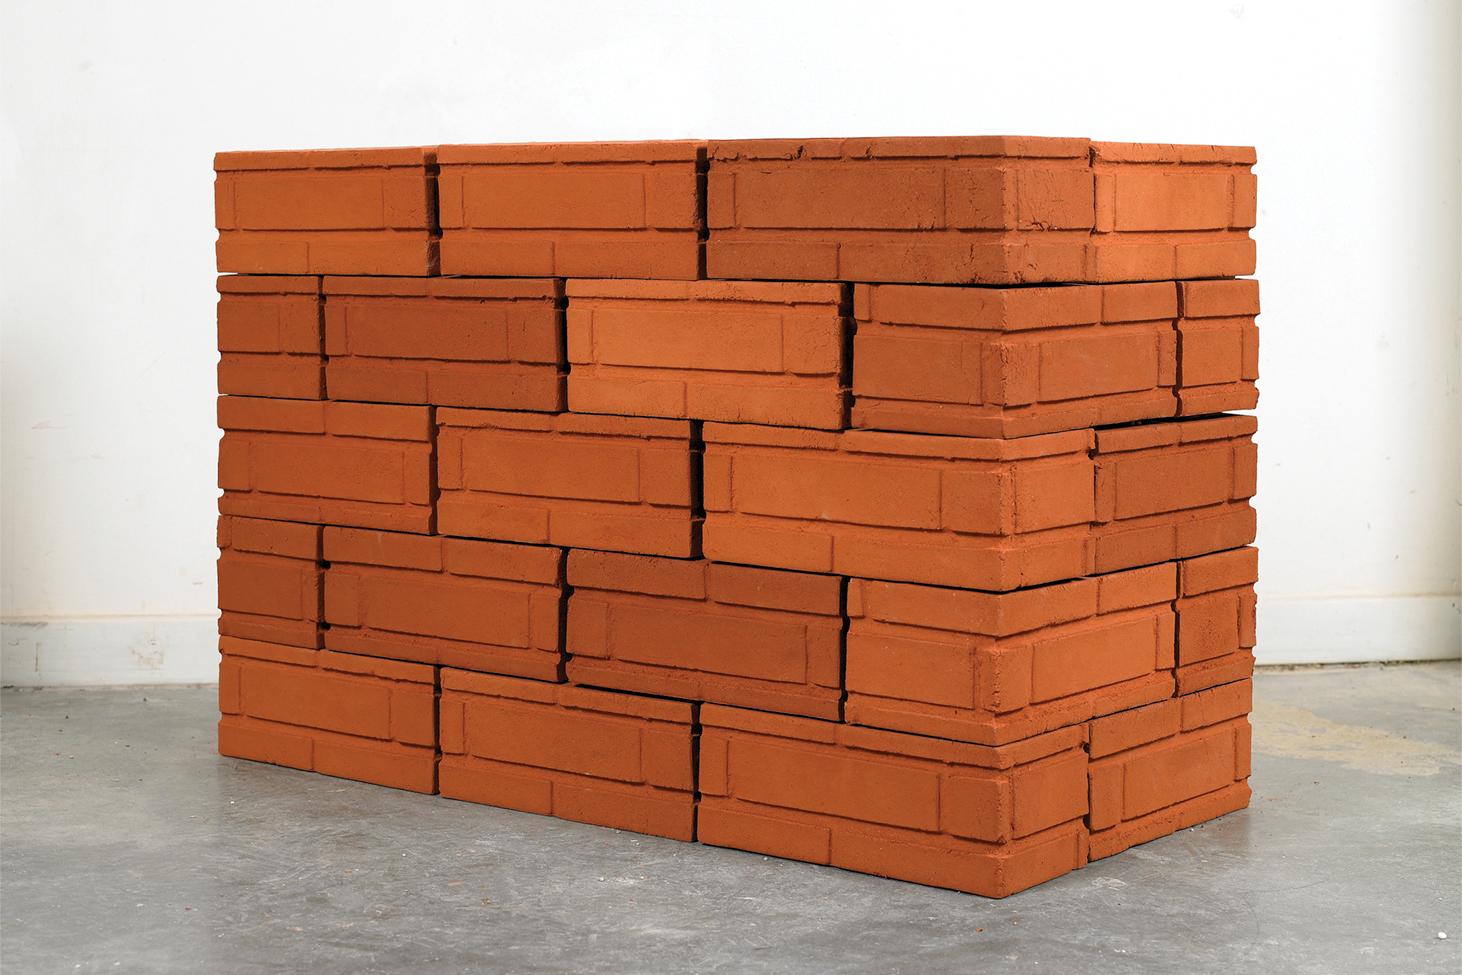 Brick-EKWC_07